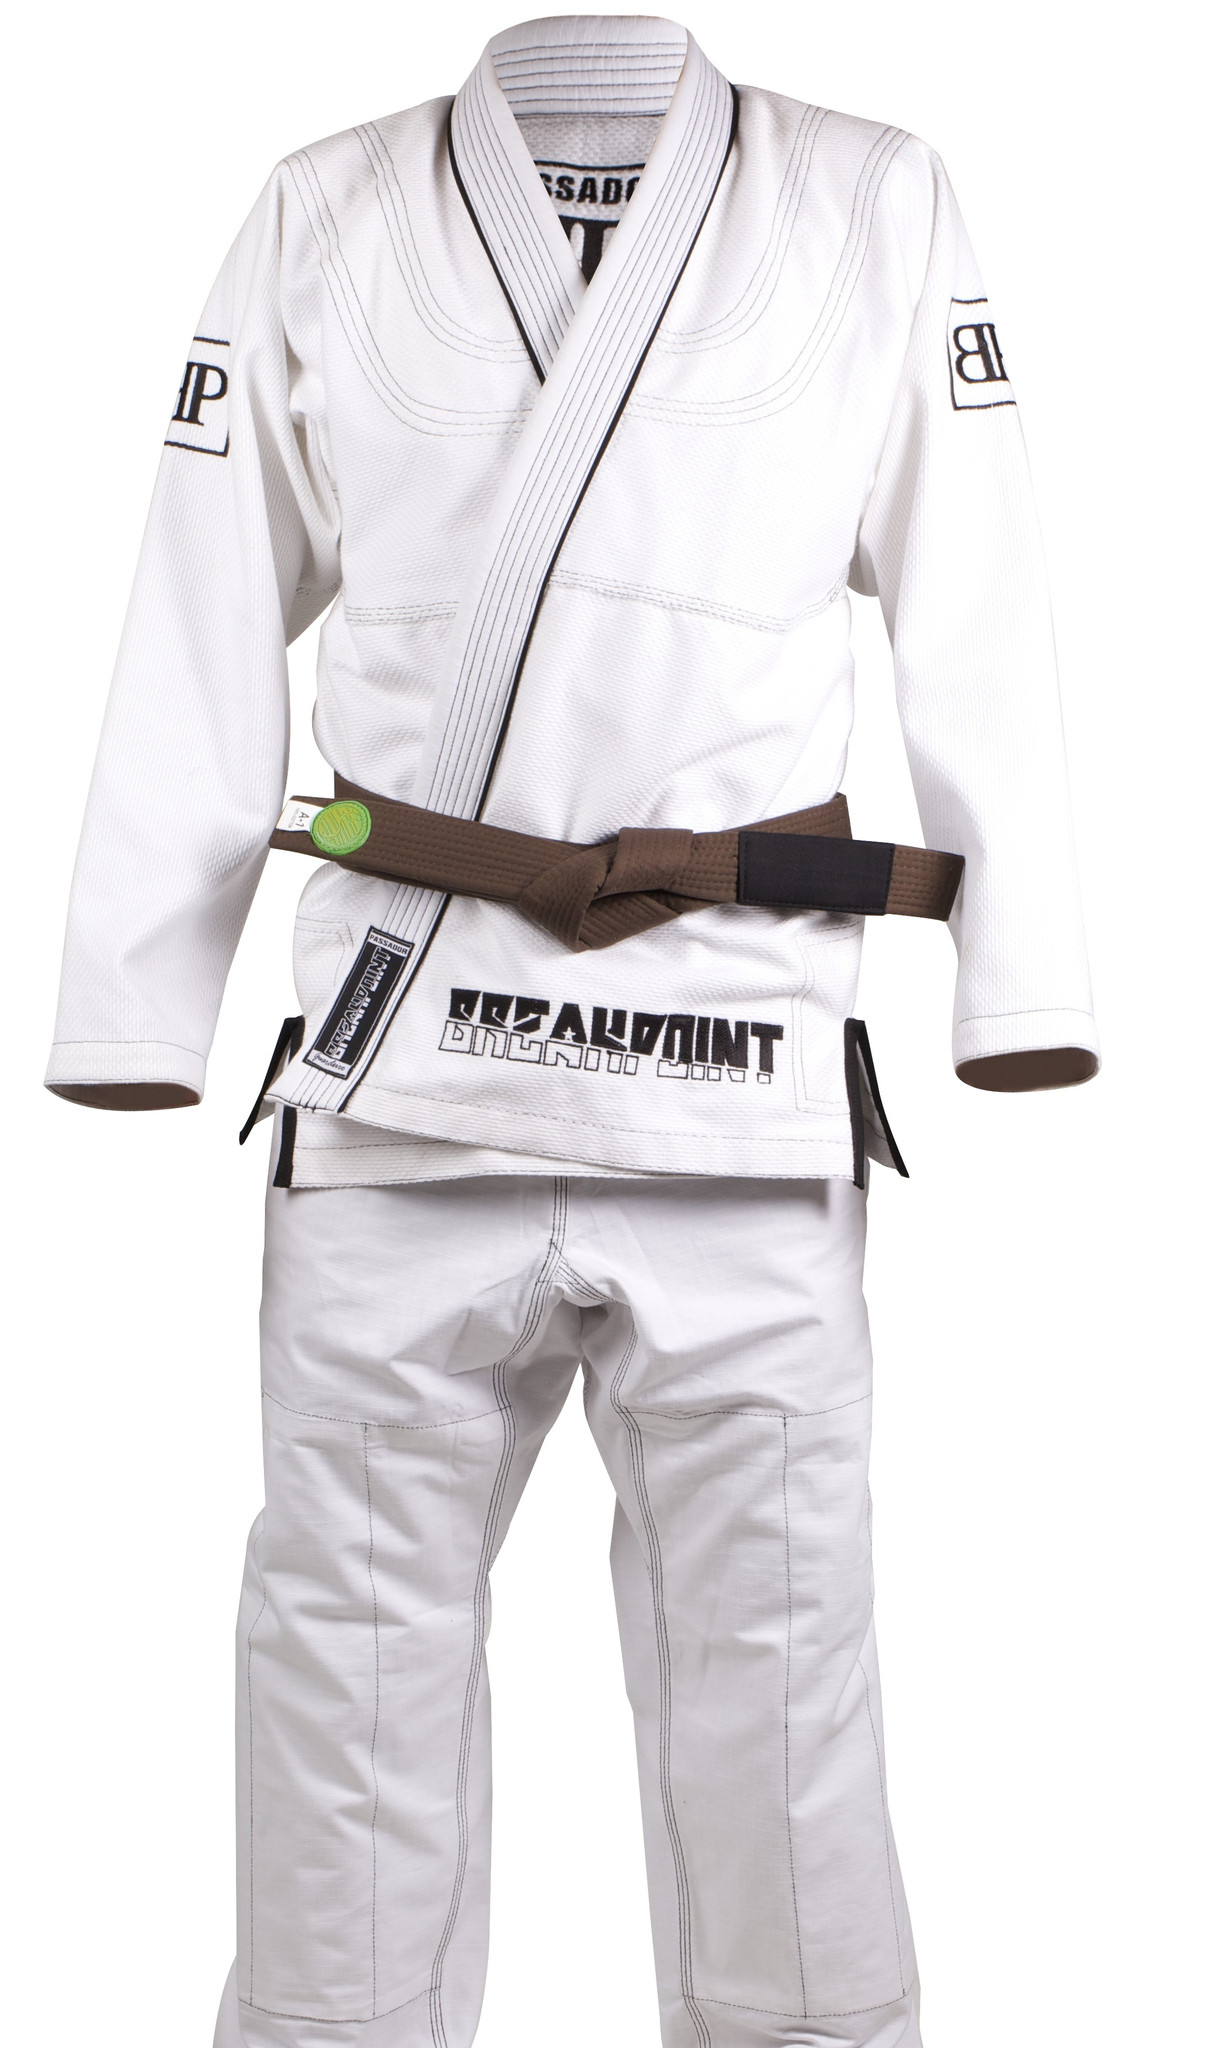 Break Point Mens Limited Edition Passador Guardeiro BJJ  Jiu Jitsu Gi - White  high quality & fast shipping